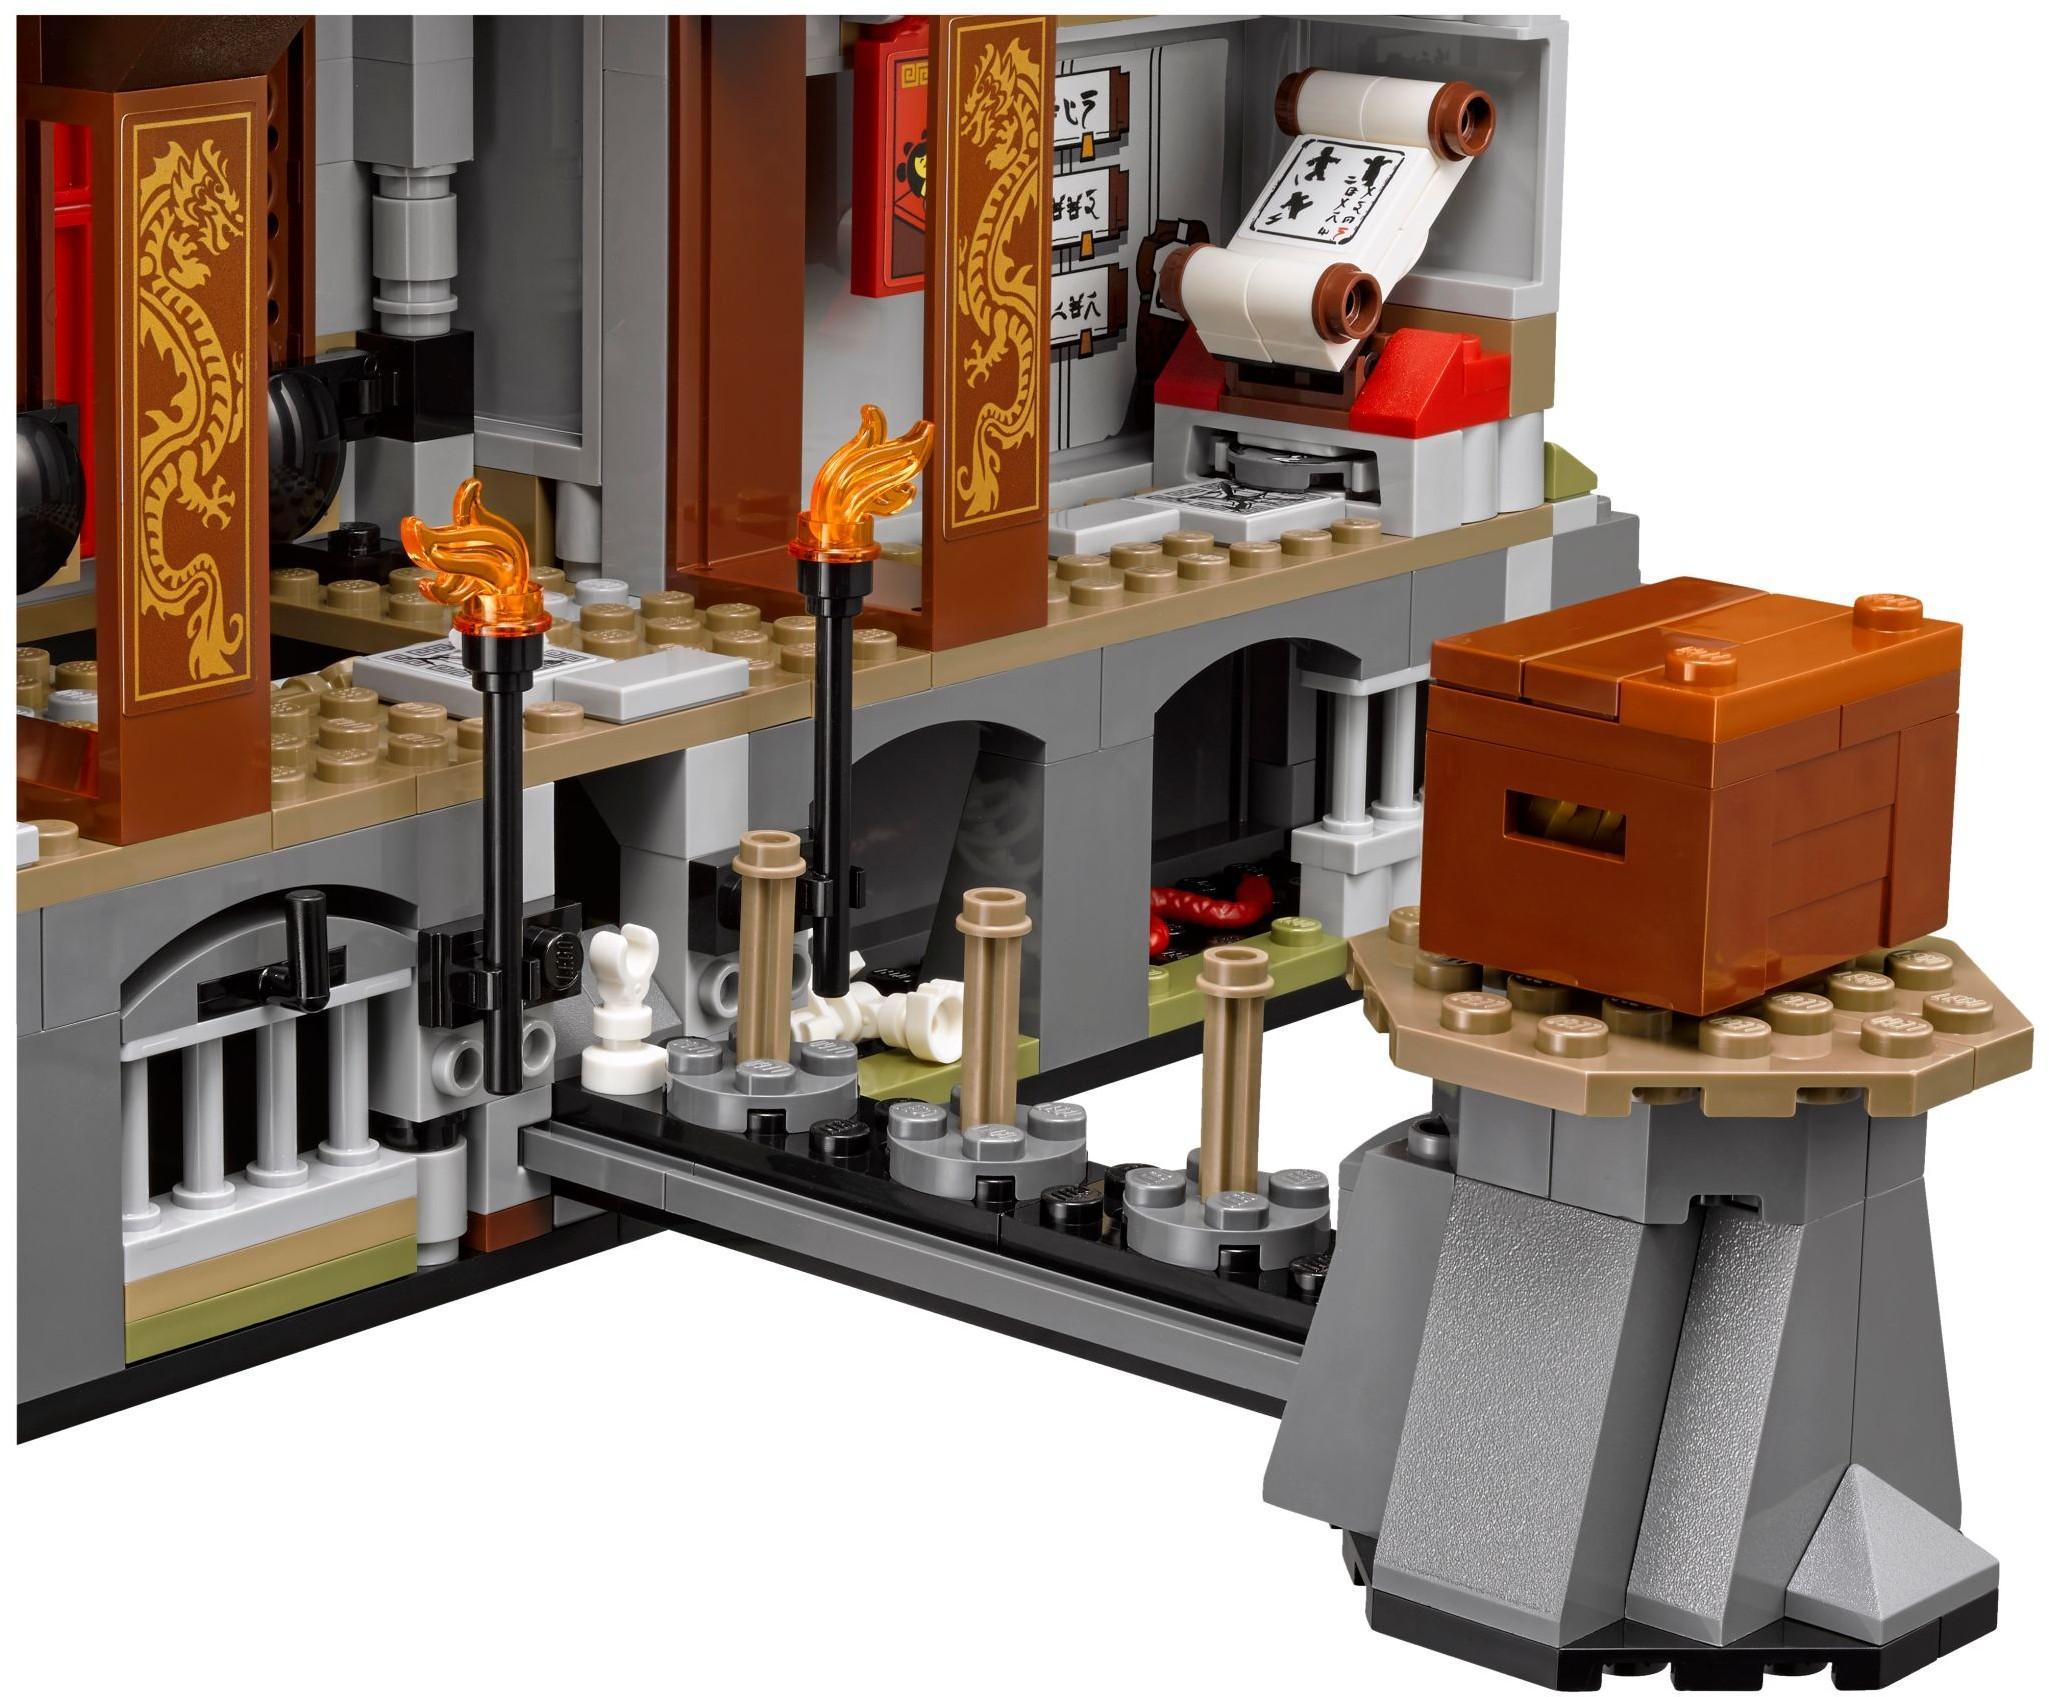 De Ultime Suprême 70617 L'arme Lego Temple Ninjago Le cuF31TlKJ